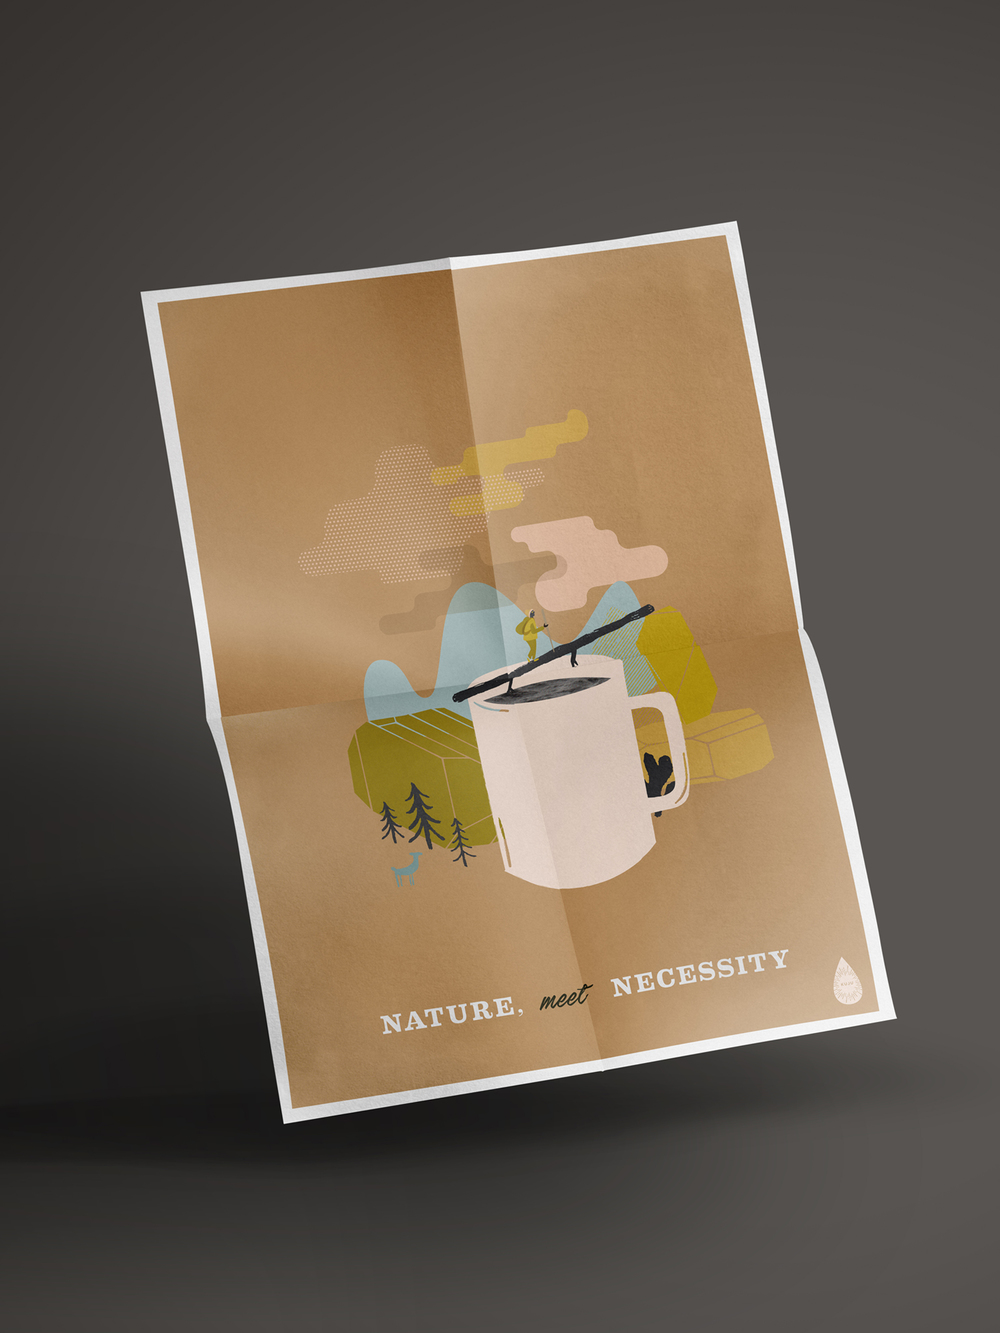 posterfront_01.jpg